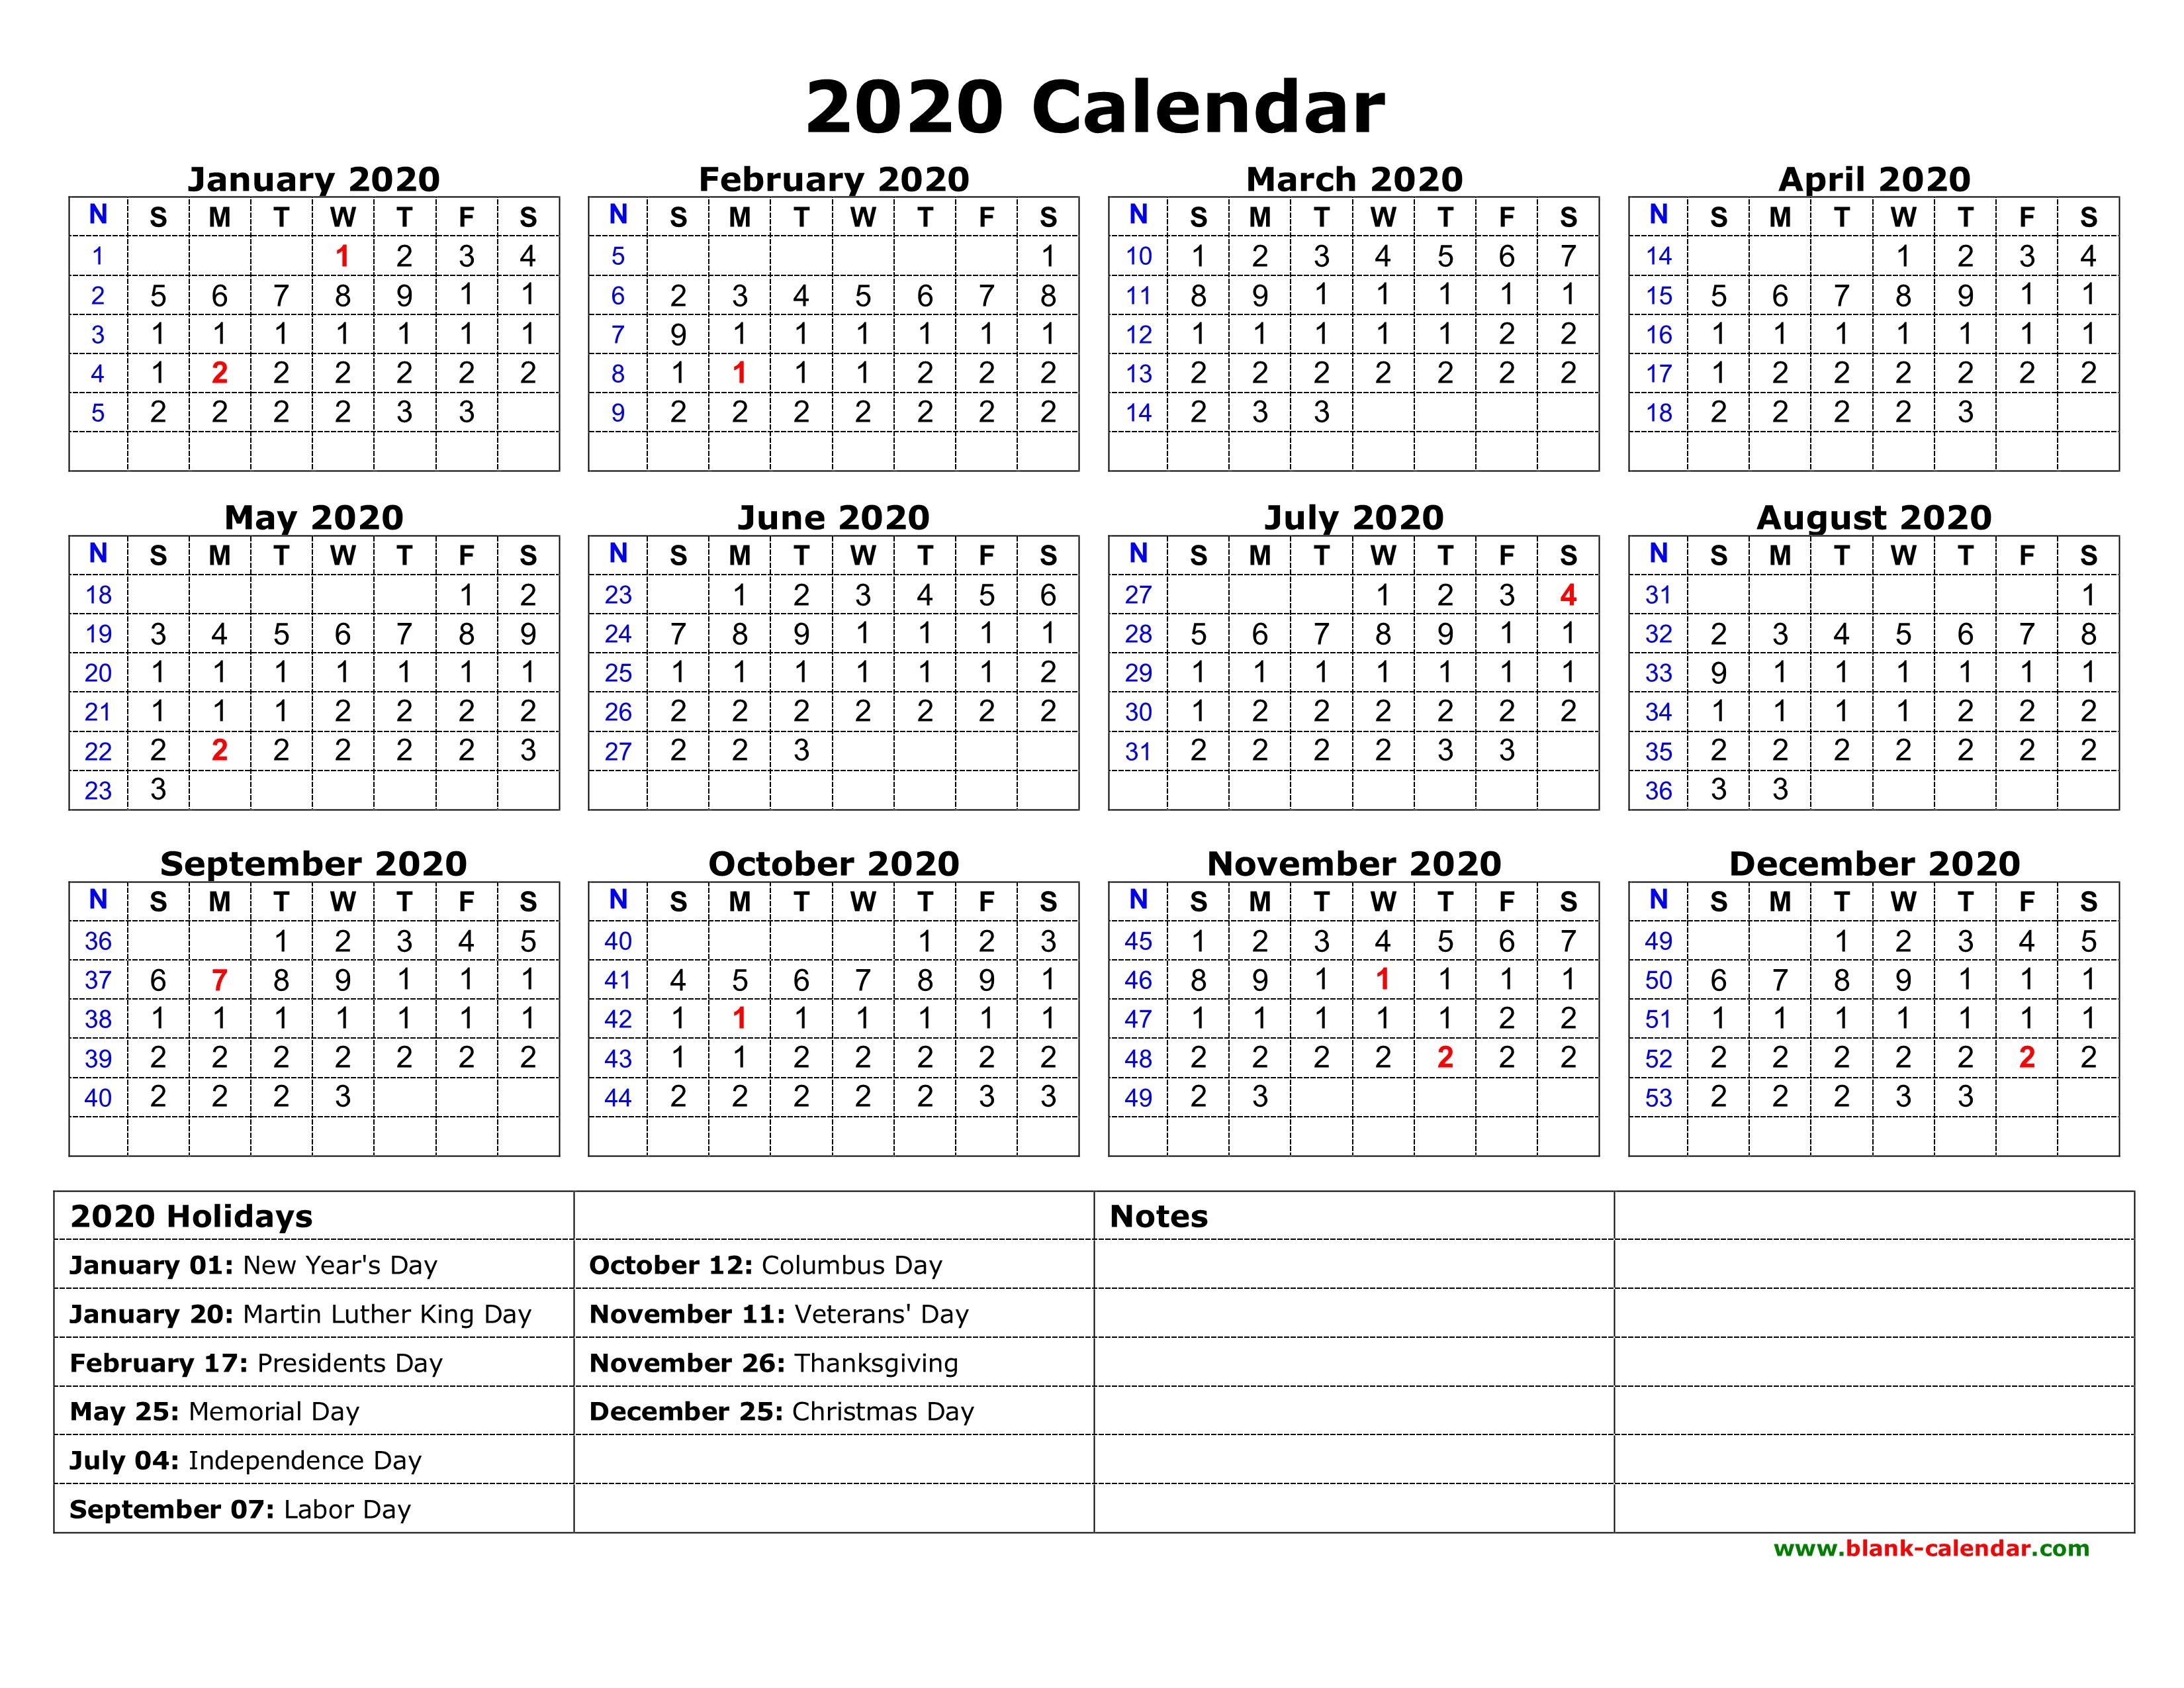 Calendar 2020 Printable With Holidays - Wpa.wpart.co in 2020 Calendar With Holidays Printable Free